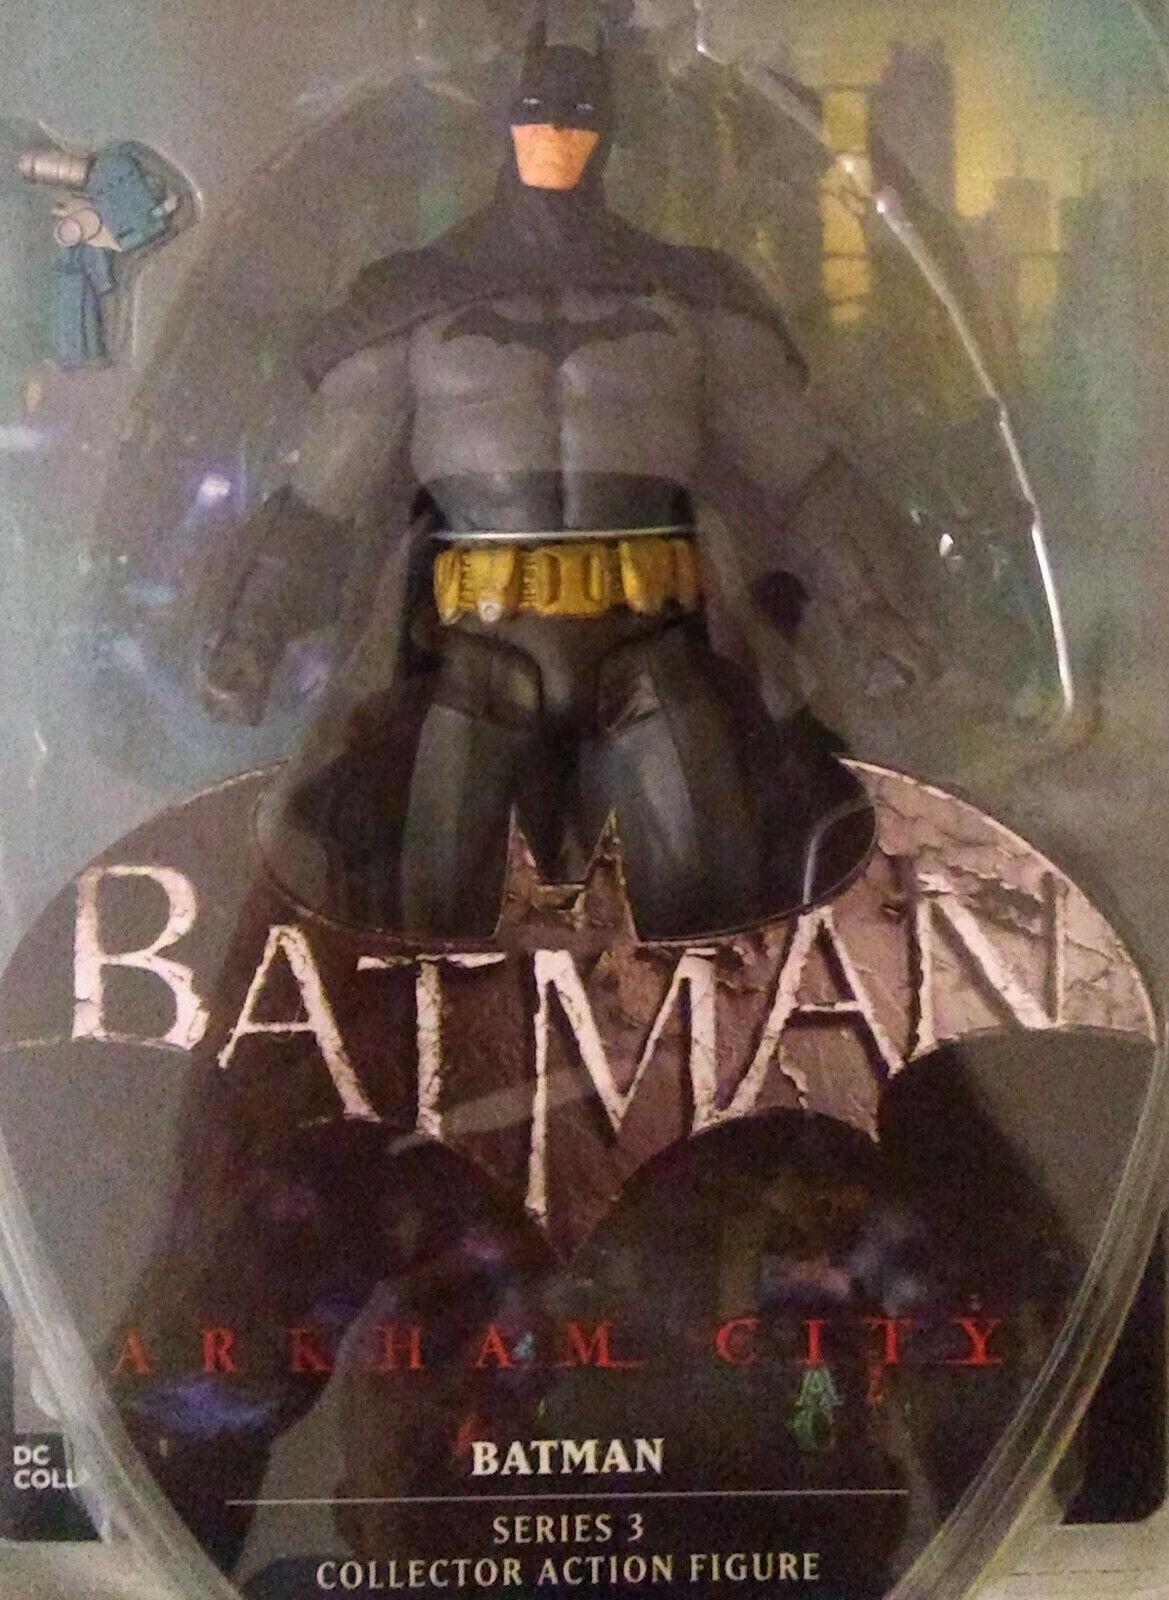 Batman Arkham City Series 3 Batman Batman Batman 6  Action Figure NEW NEW FREE SHIPPING 675bb9